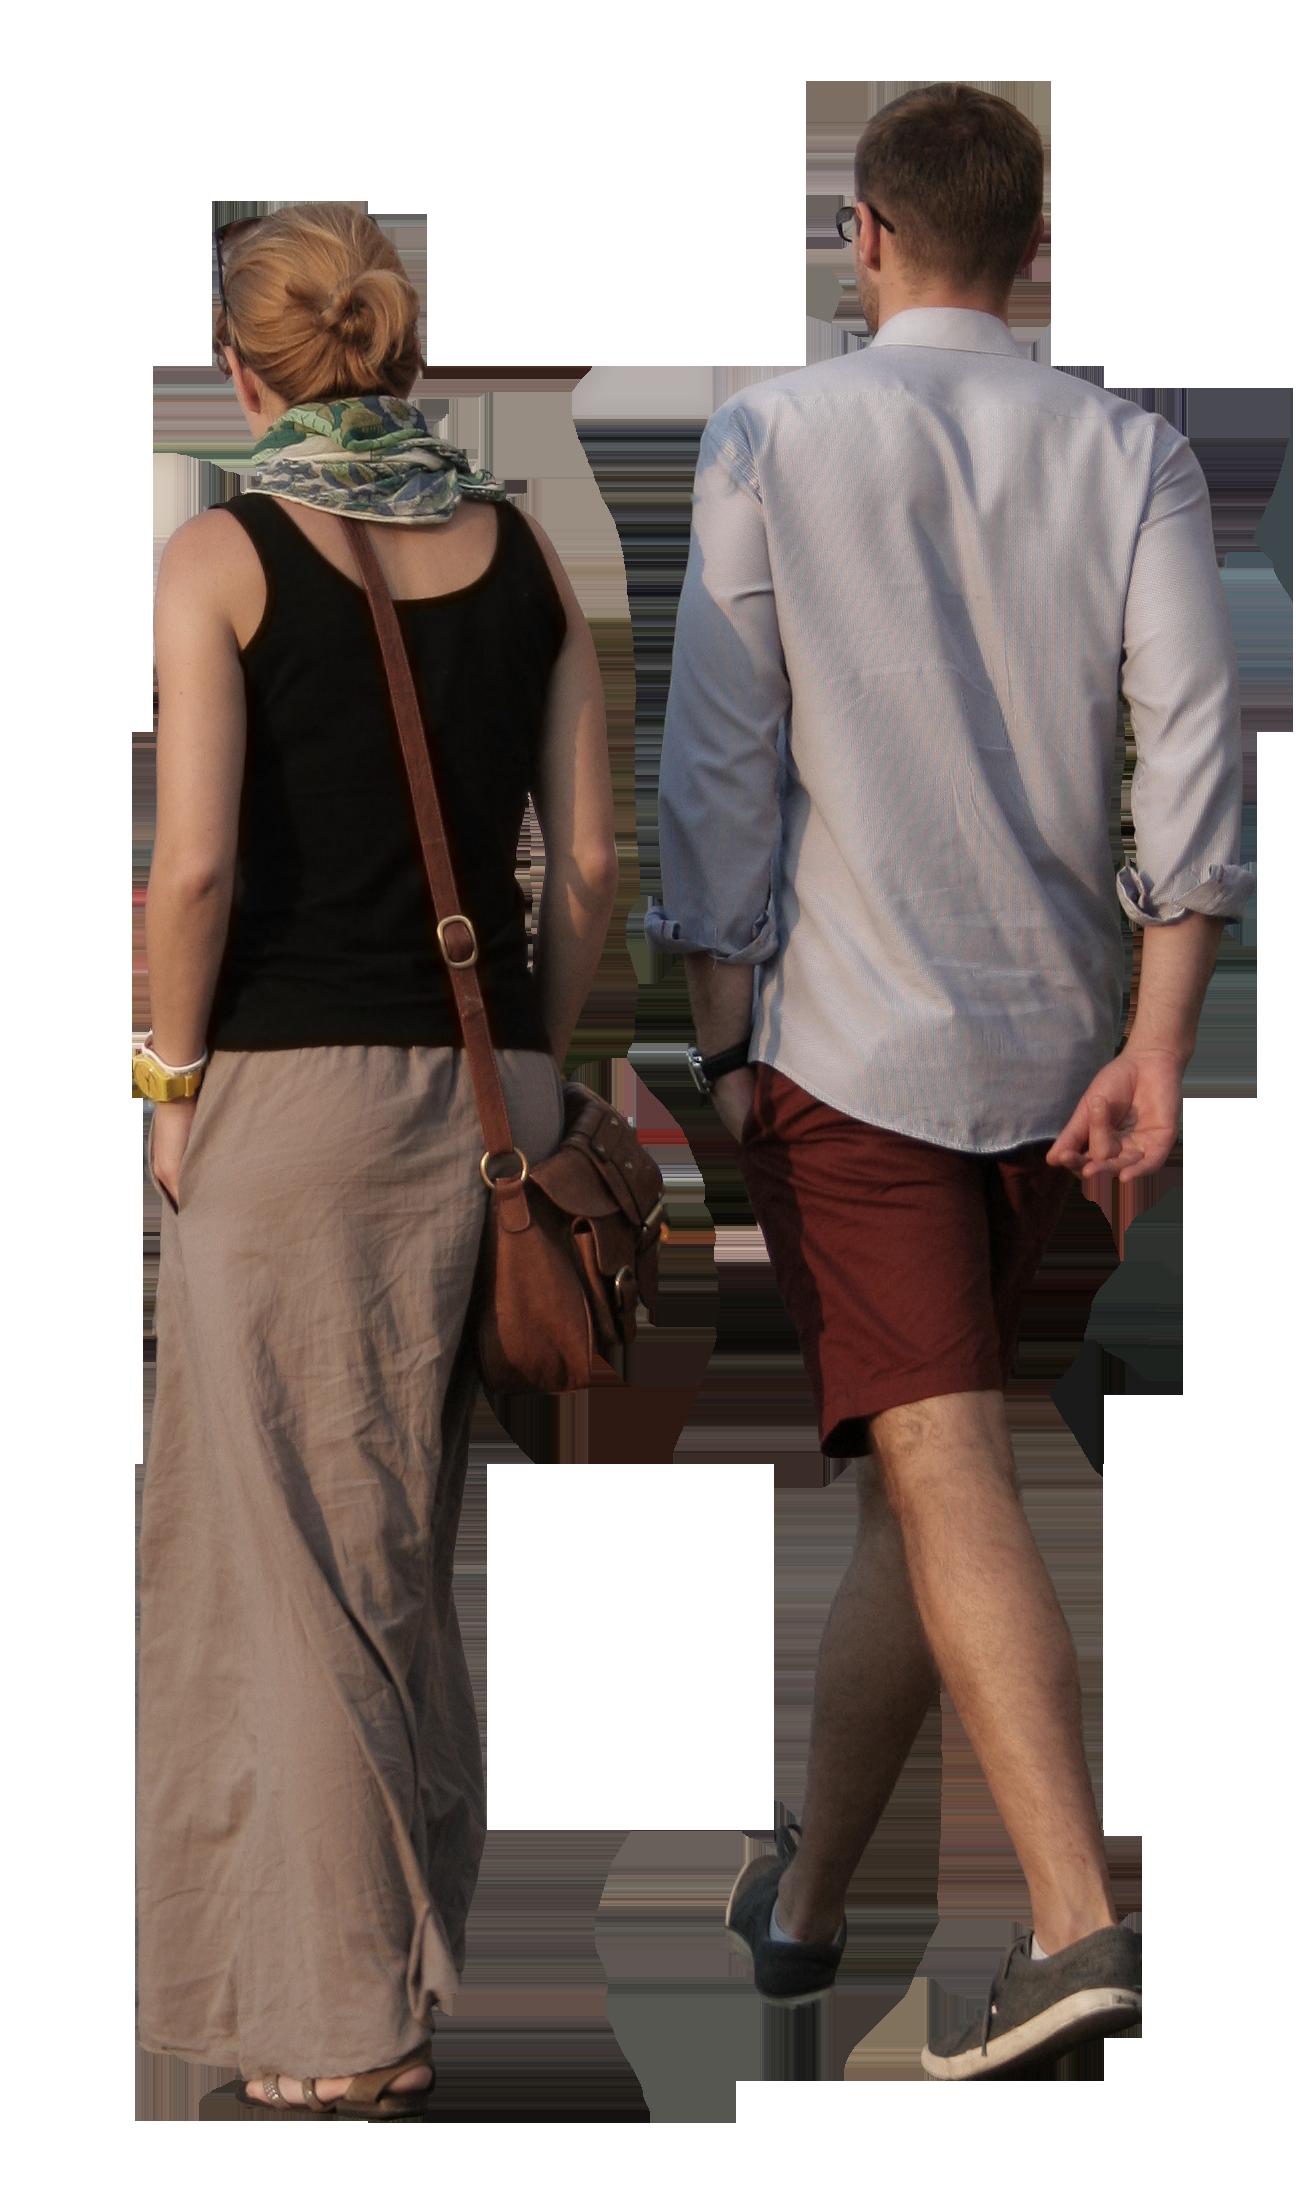 pin by m f on cutouts people walking png harem pants pants